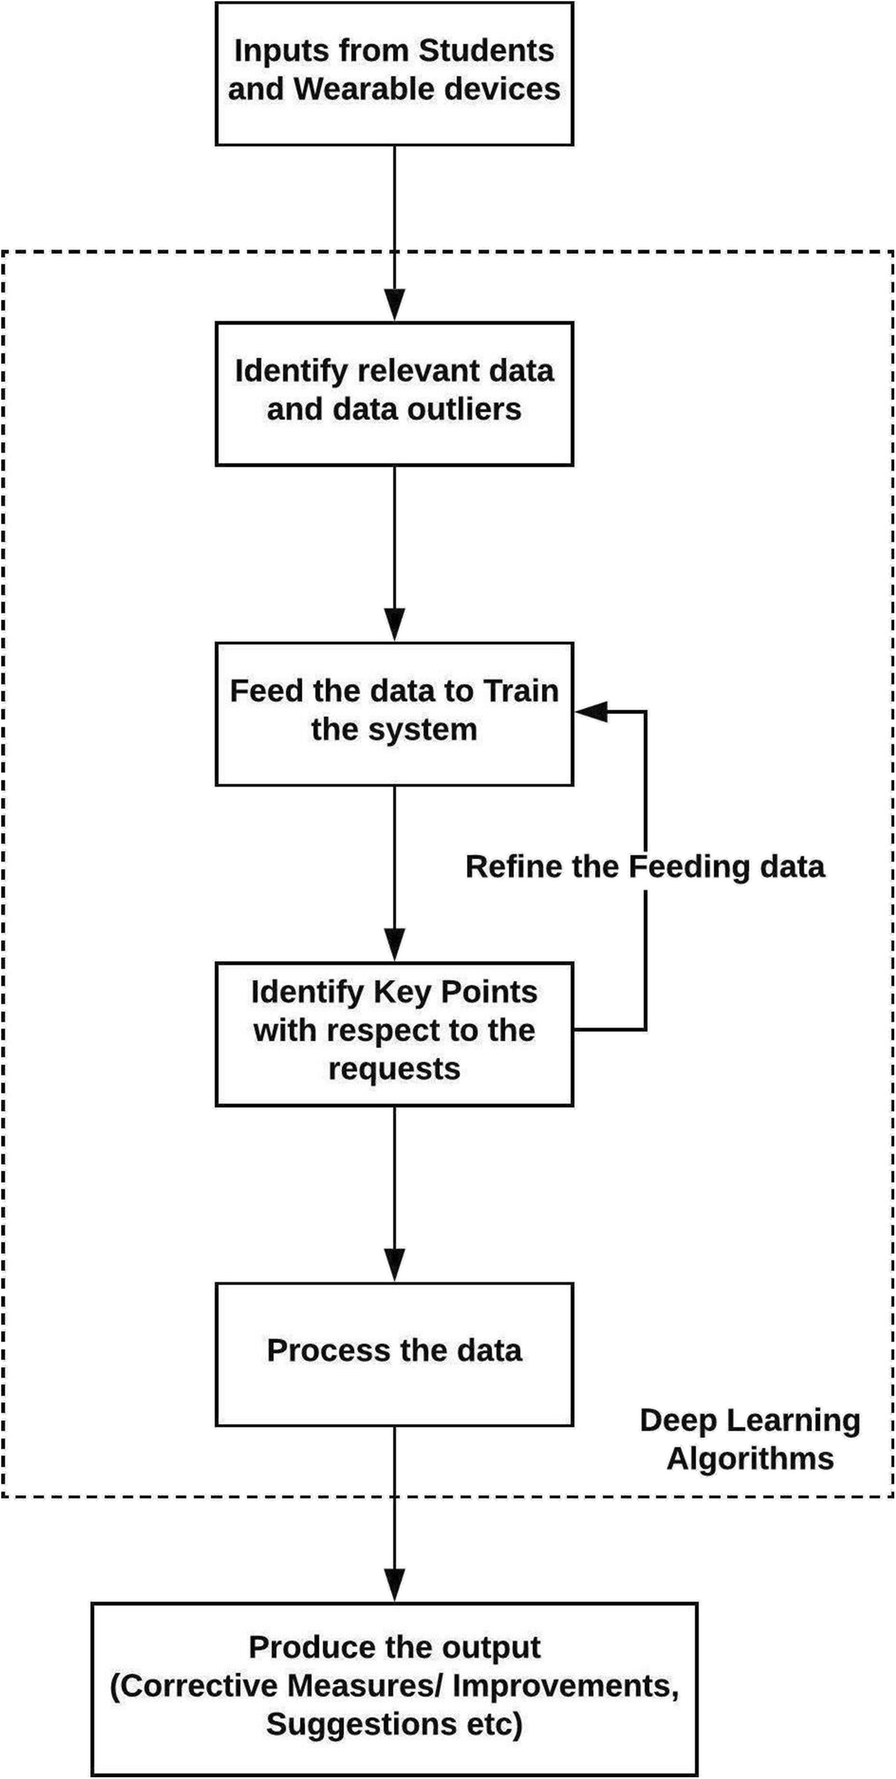 Learning analytics for IoE based educational model using